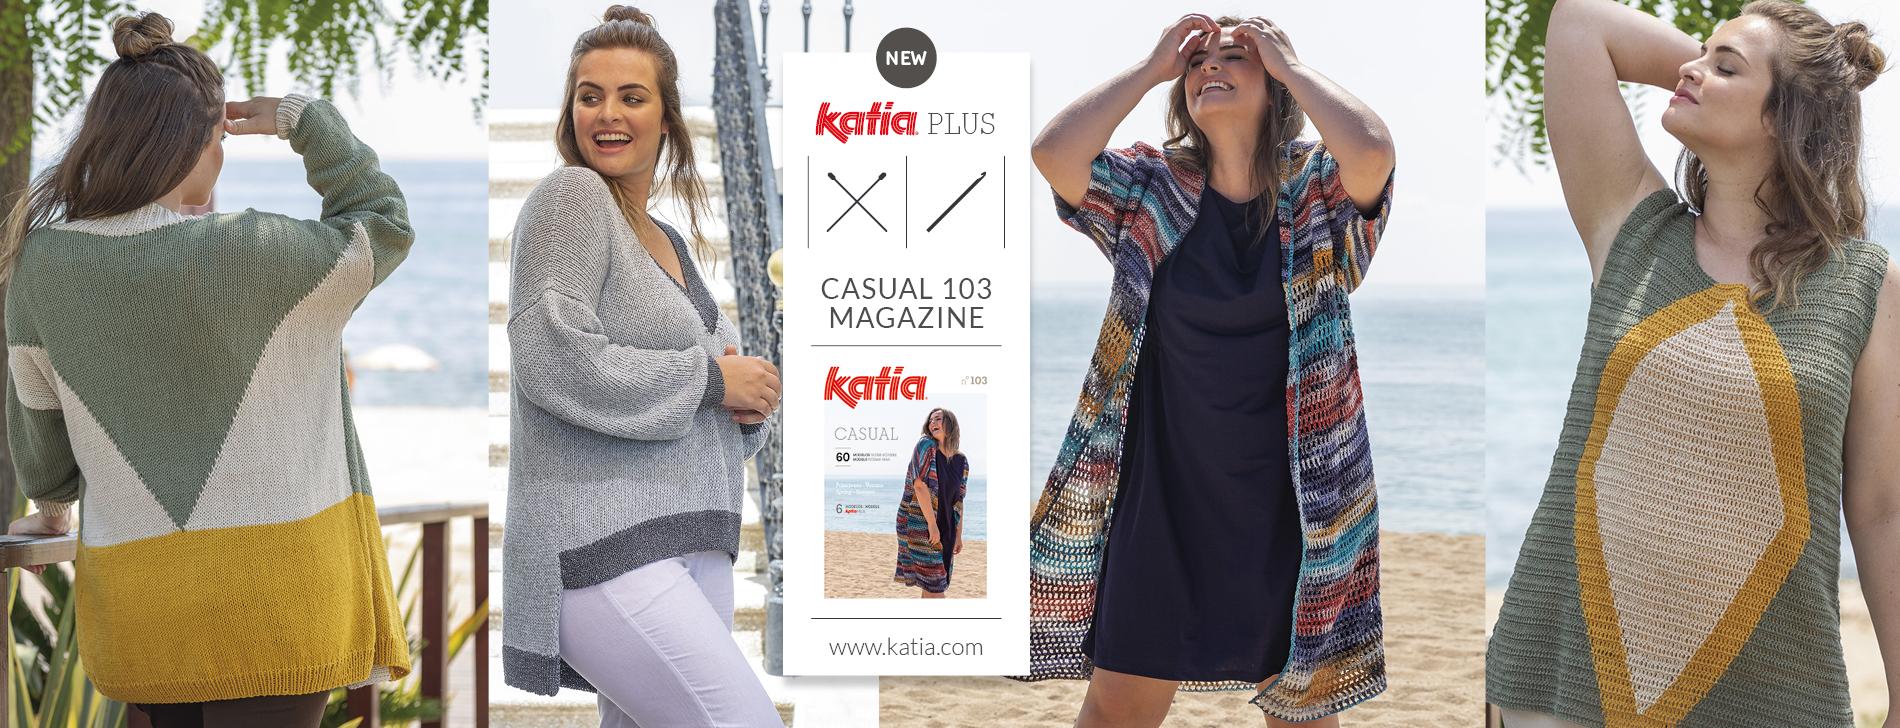 Katia-Plus-Casual-103